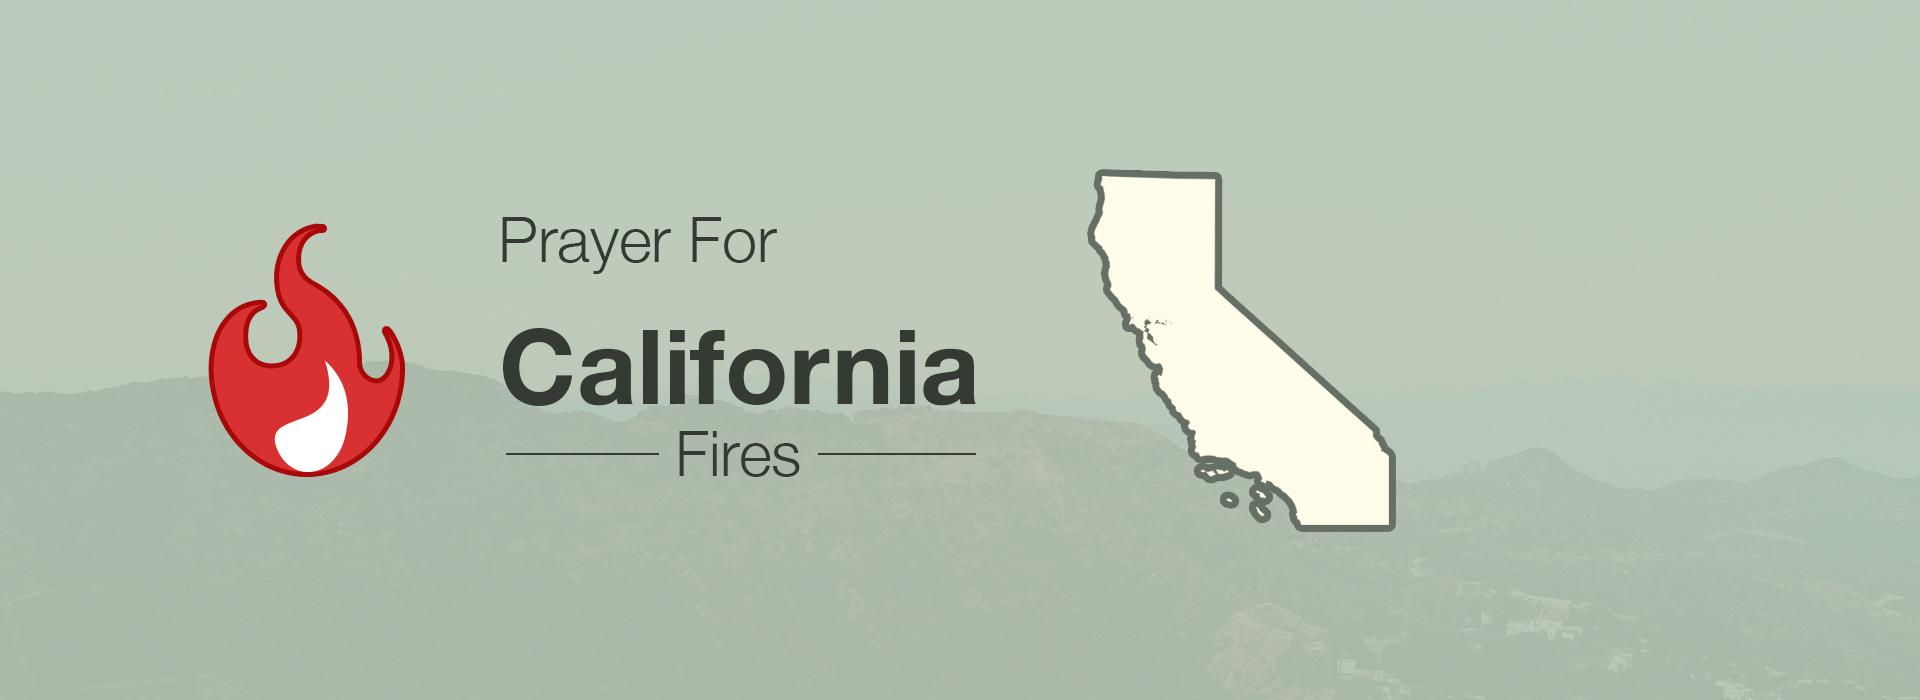 FastingPrayerDay_California.jpg